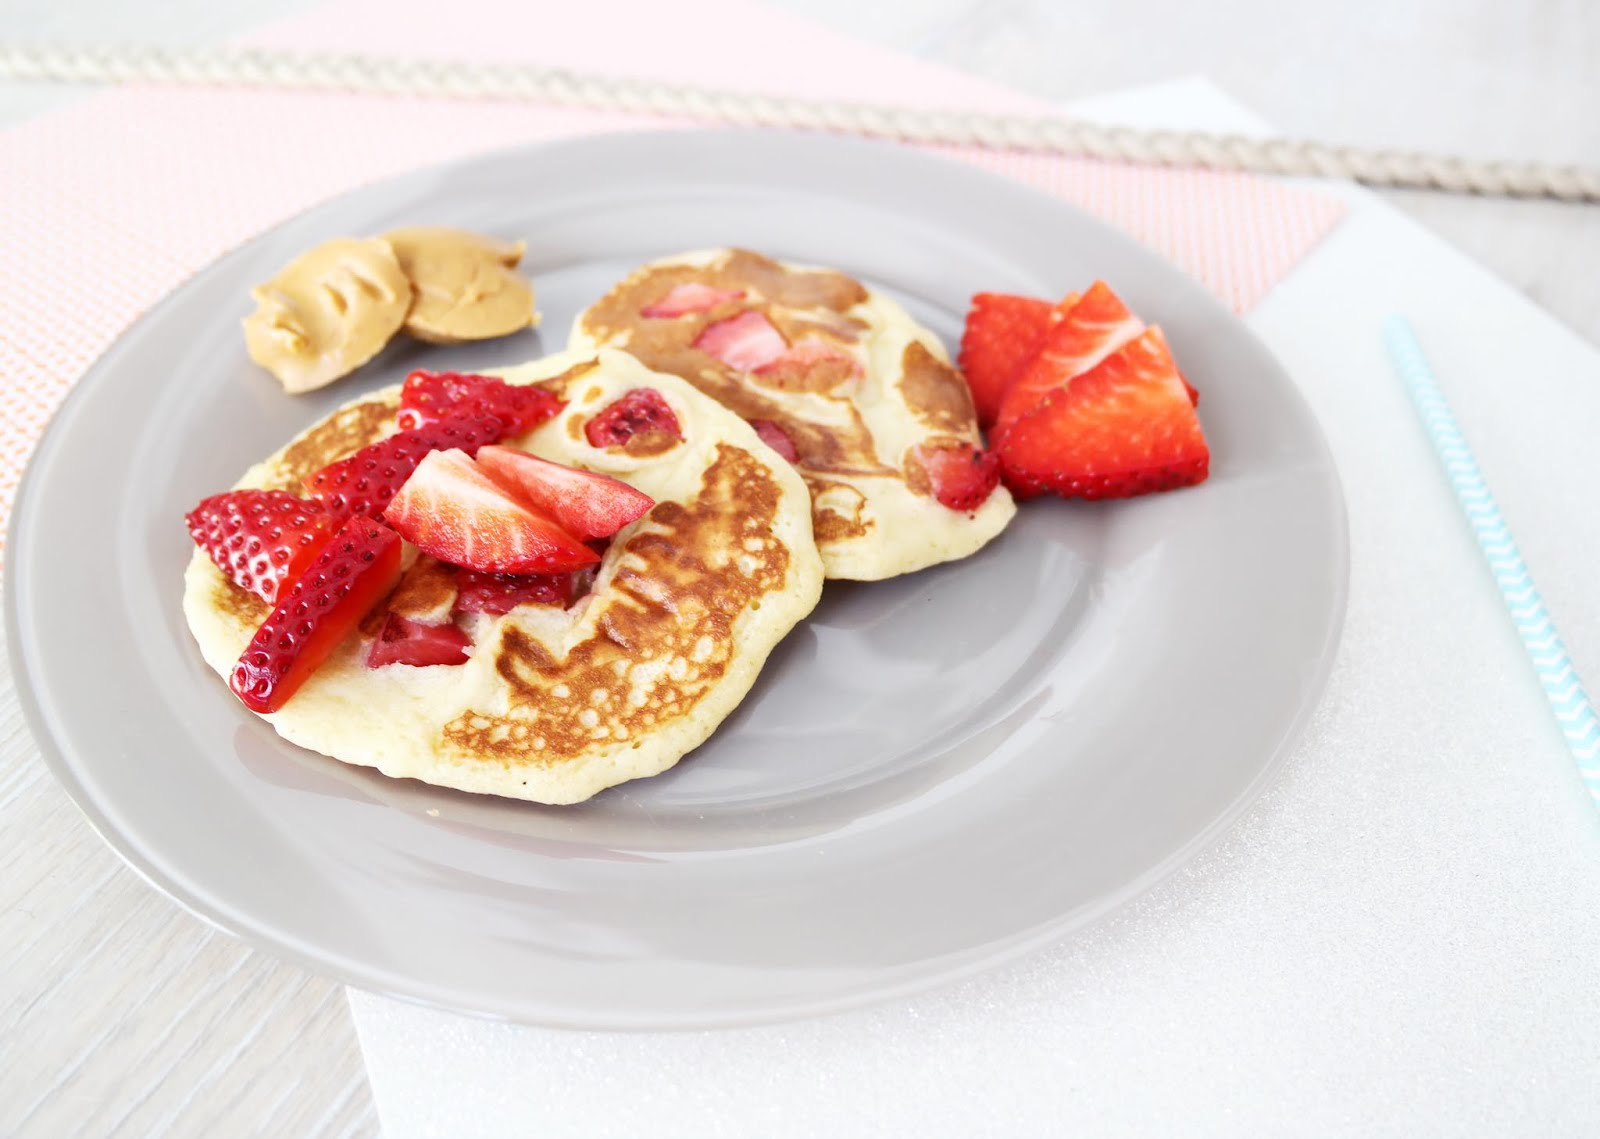 pancakes banane fraise la recette shylylovely. Black Bedroom Furniture Sets. Home Design Ideas